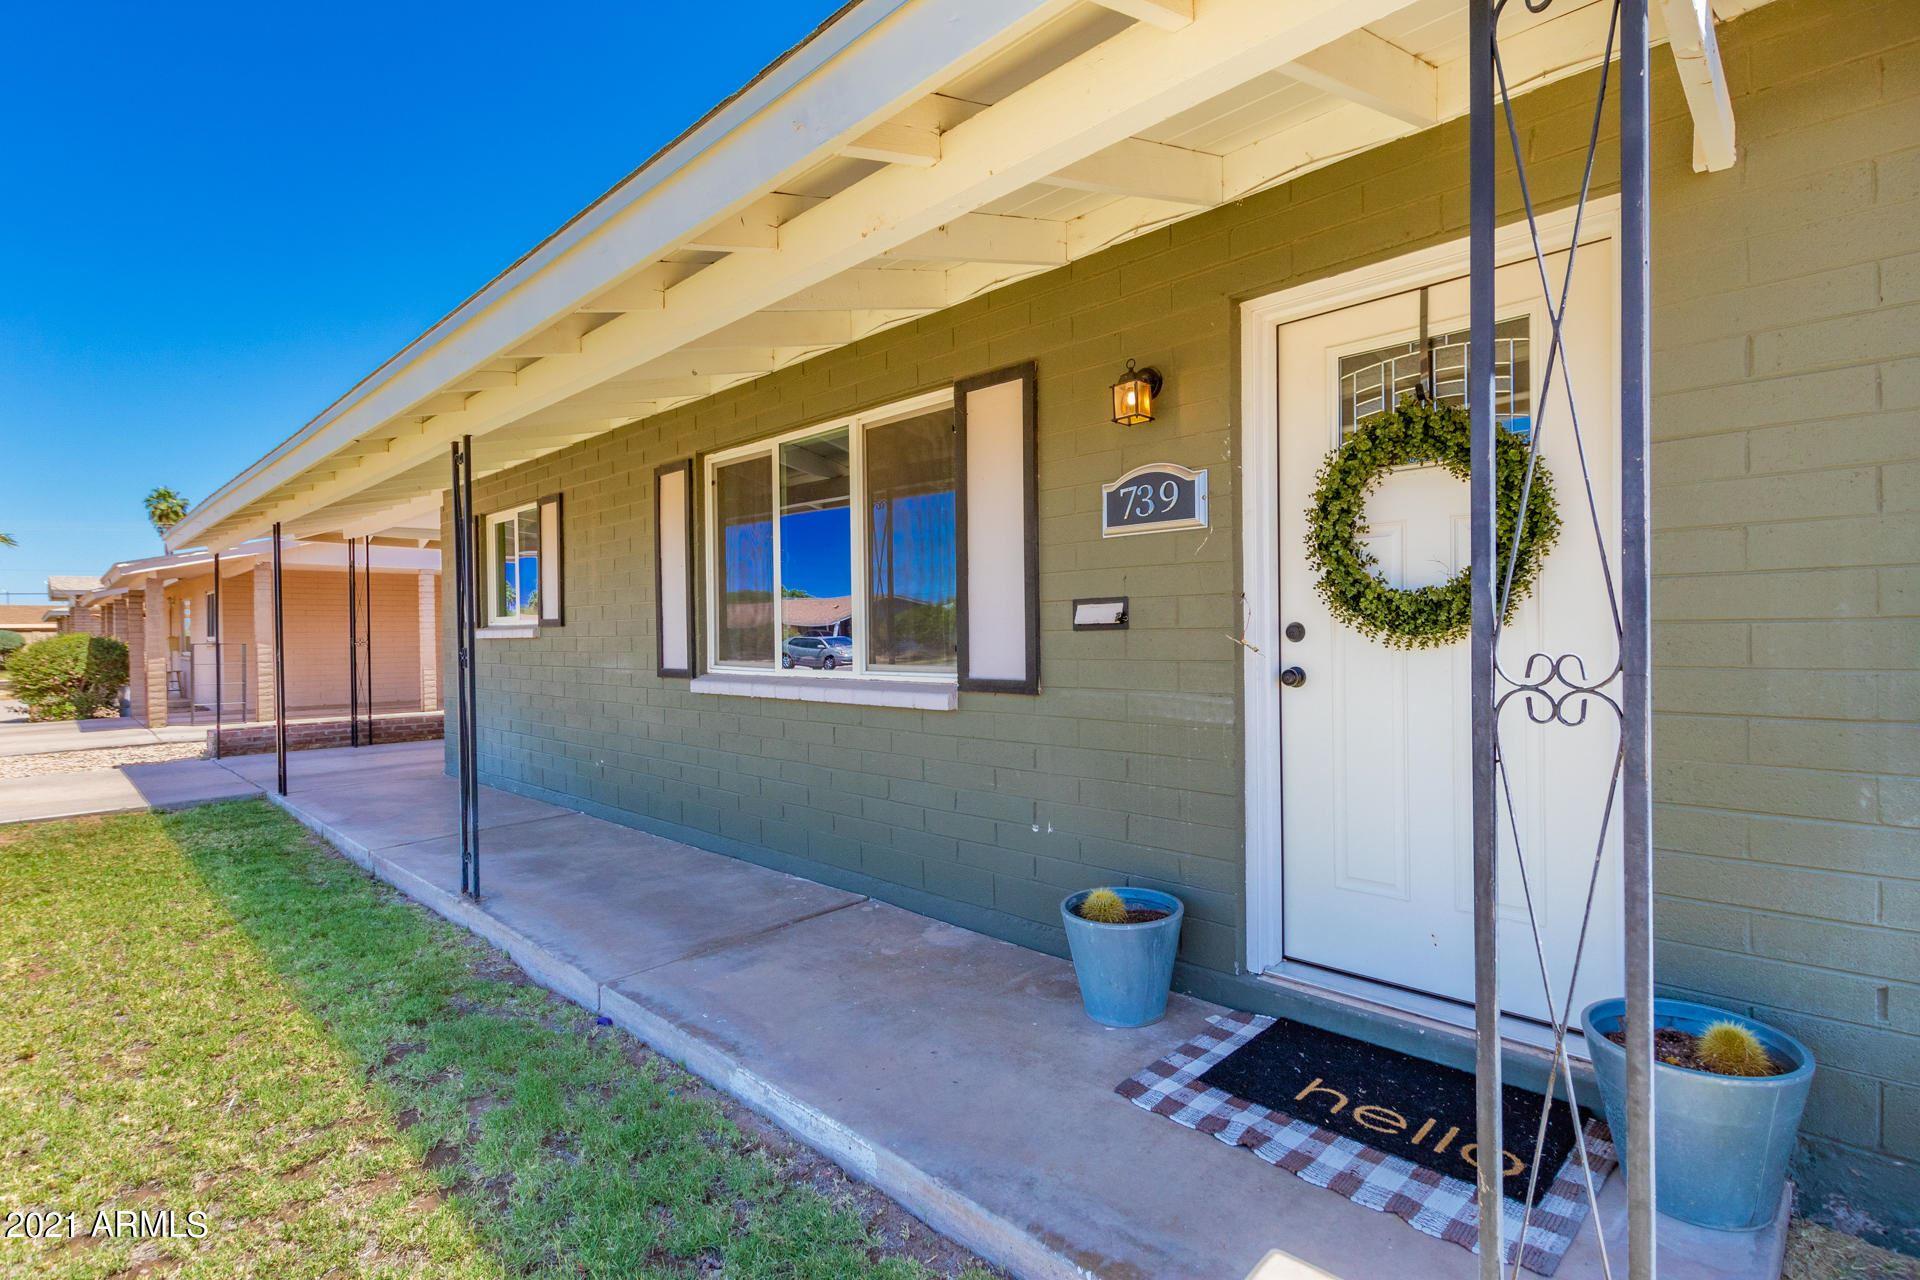 Photo of 739 N STANDAGE --, Mesa, AZ 85201 (MLS # 6232525)